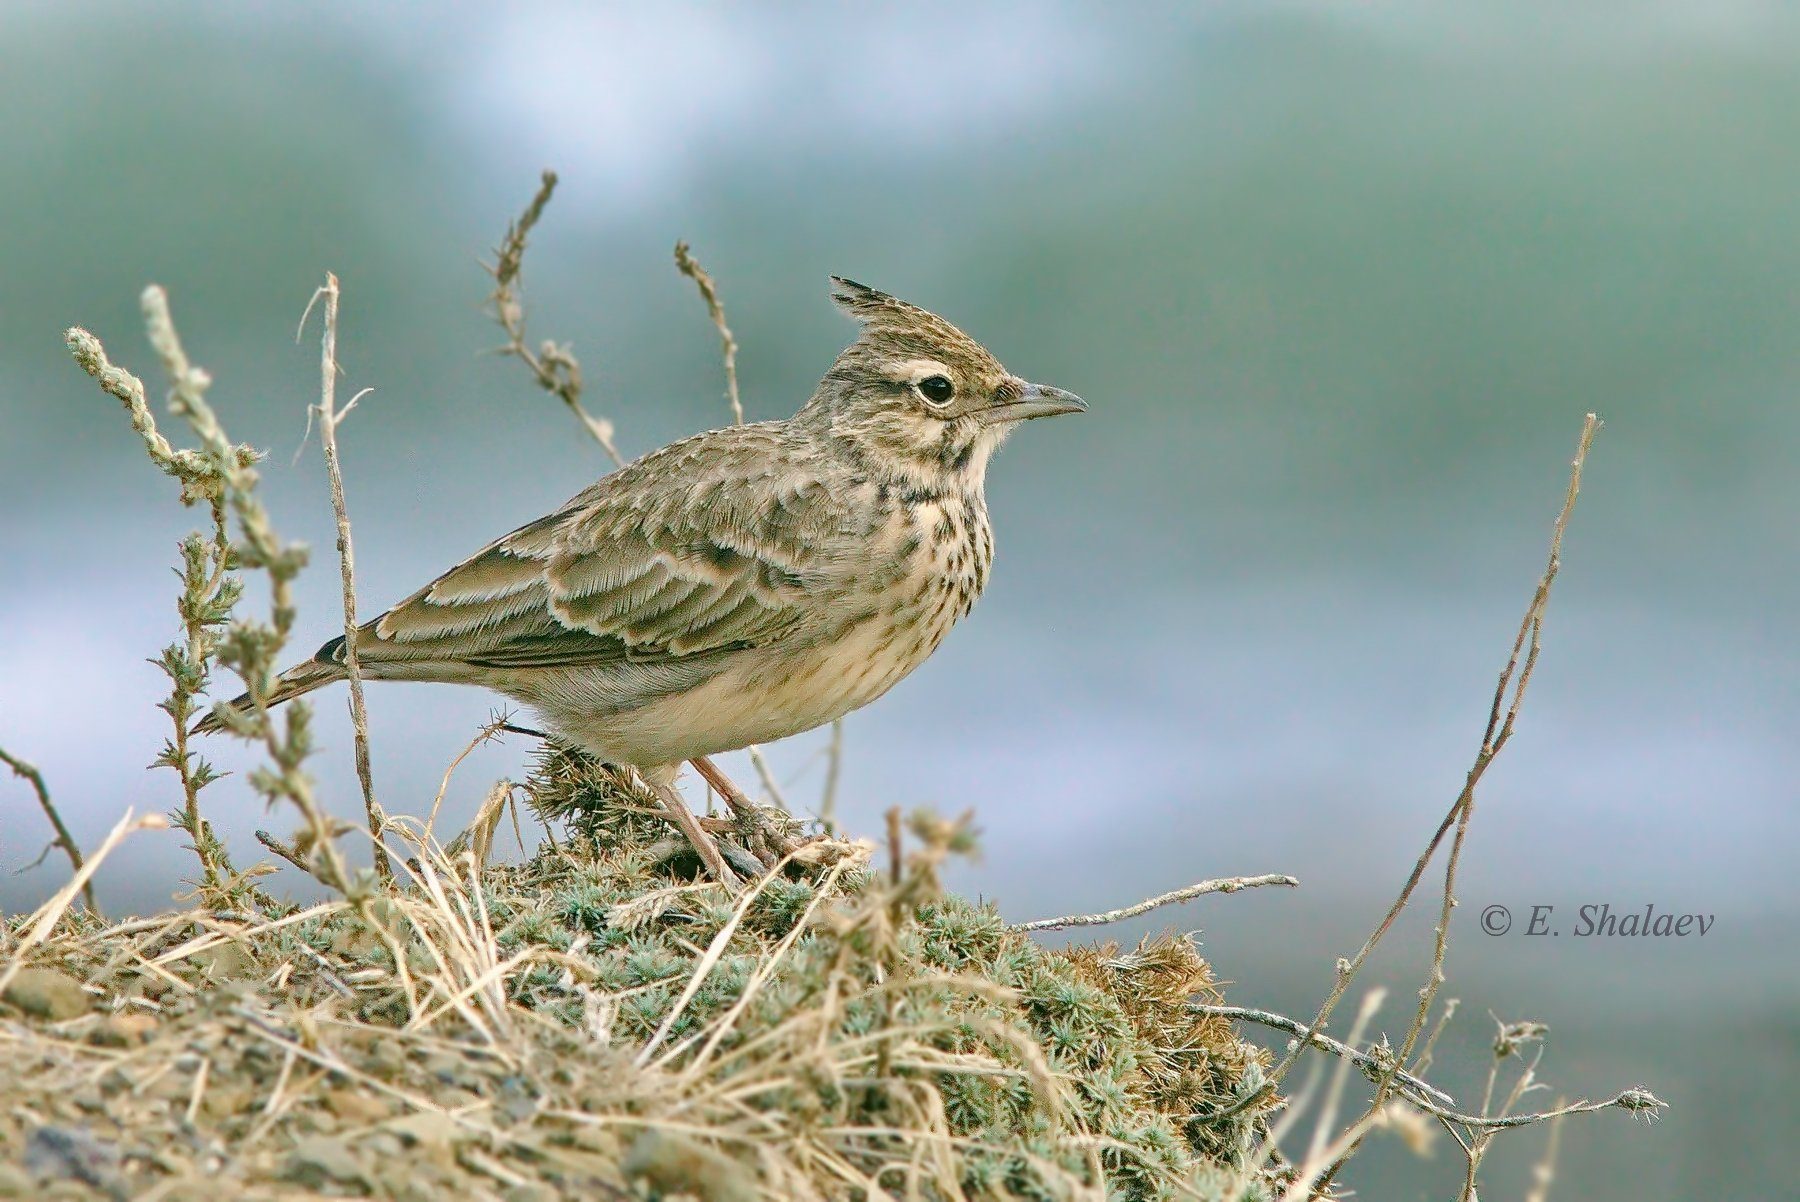 birds, хохлатый жаворонок,птица,птицы,фотоохота,galerida cristata, Евгений